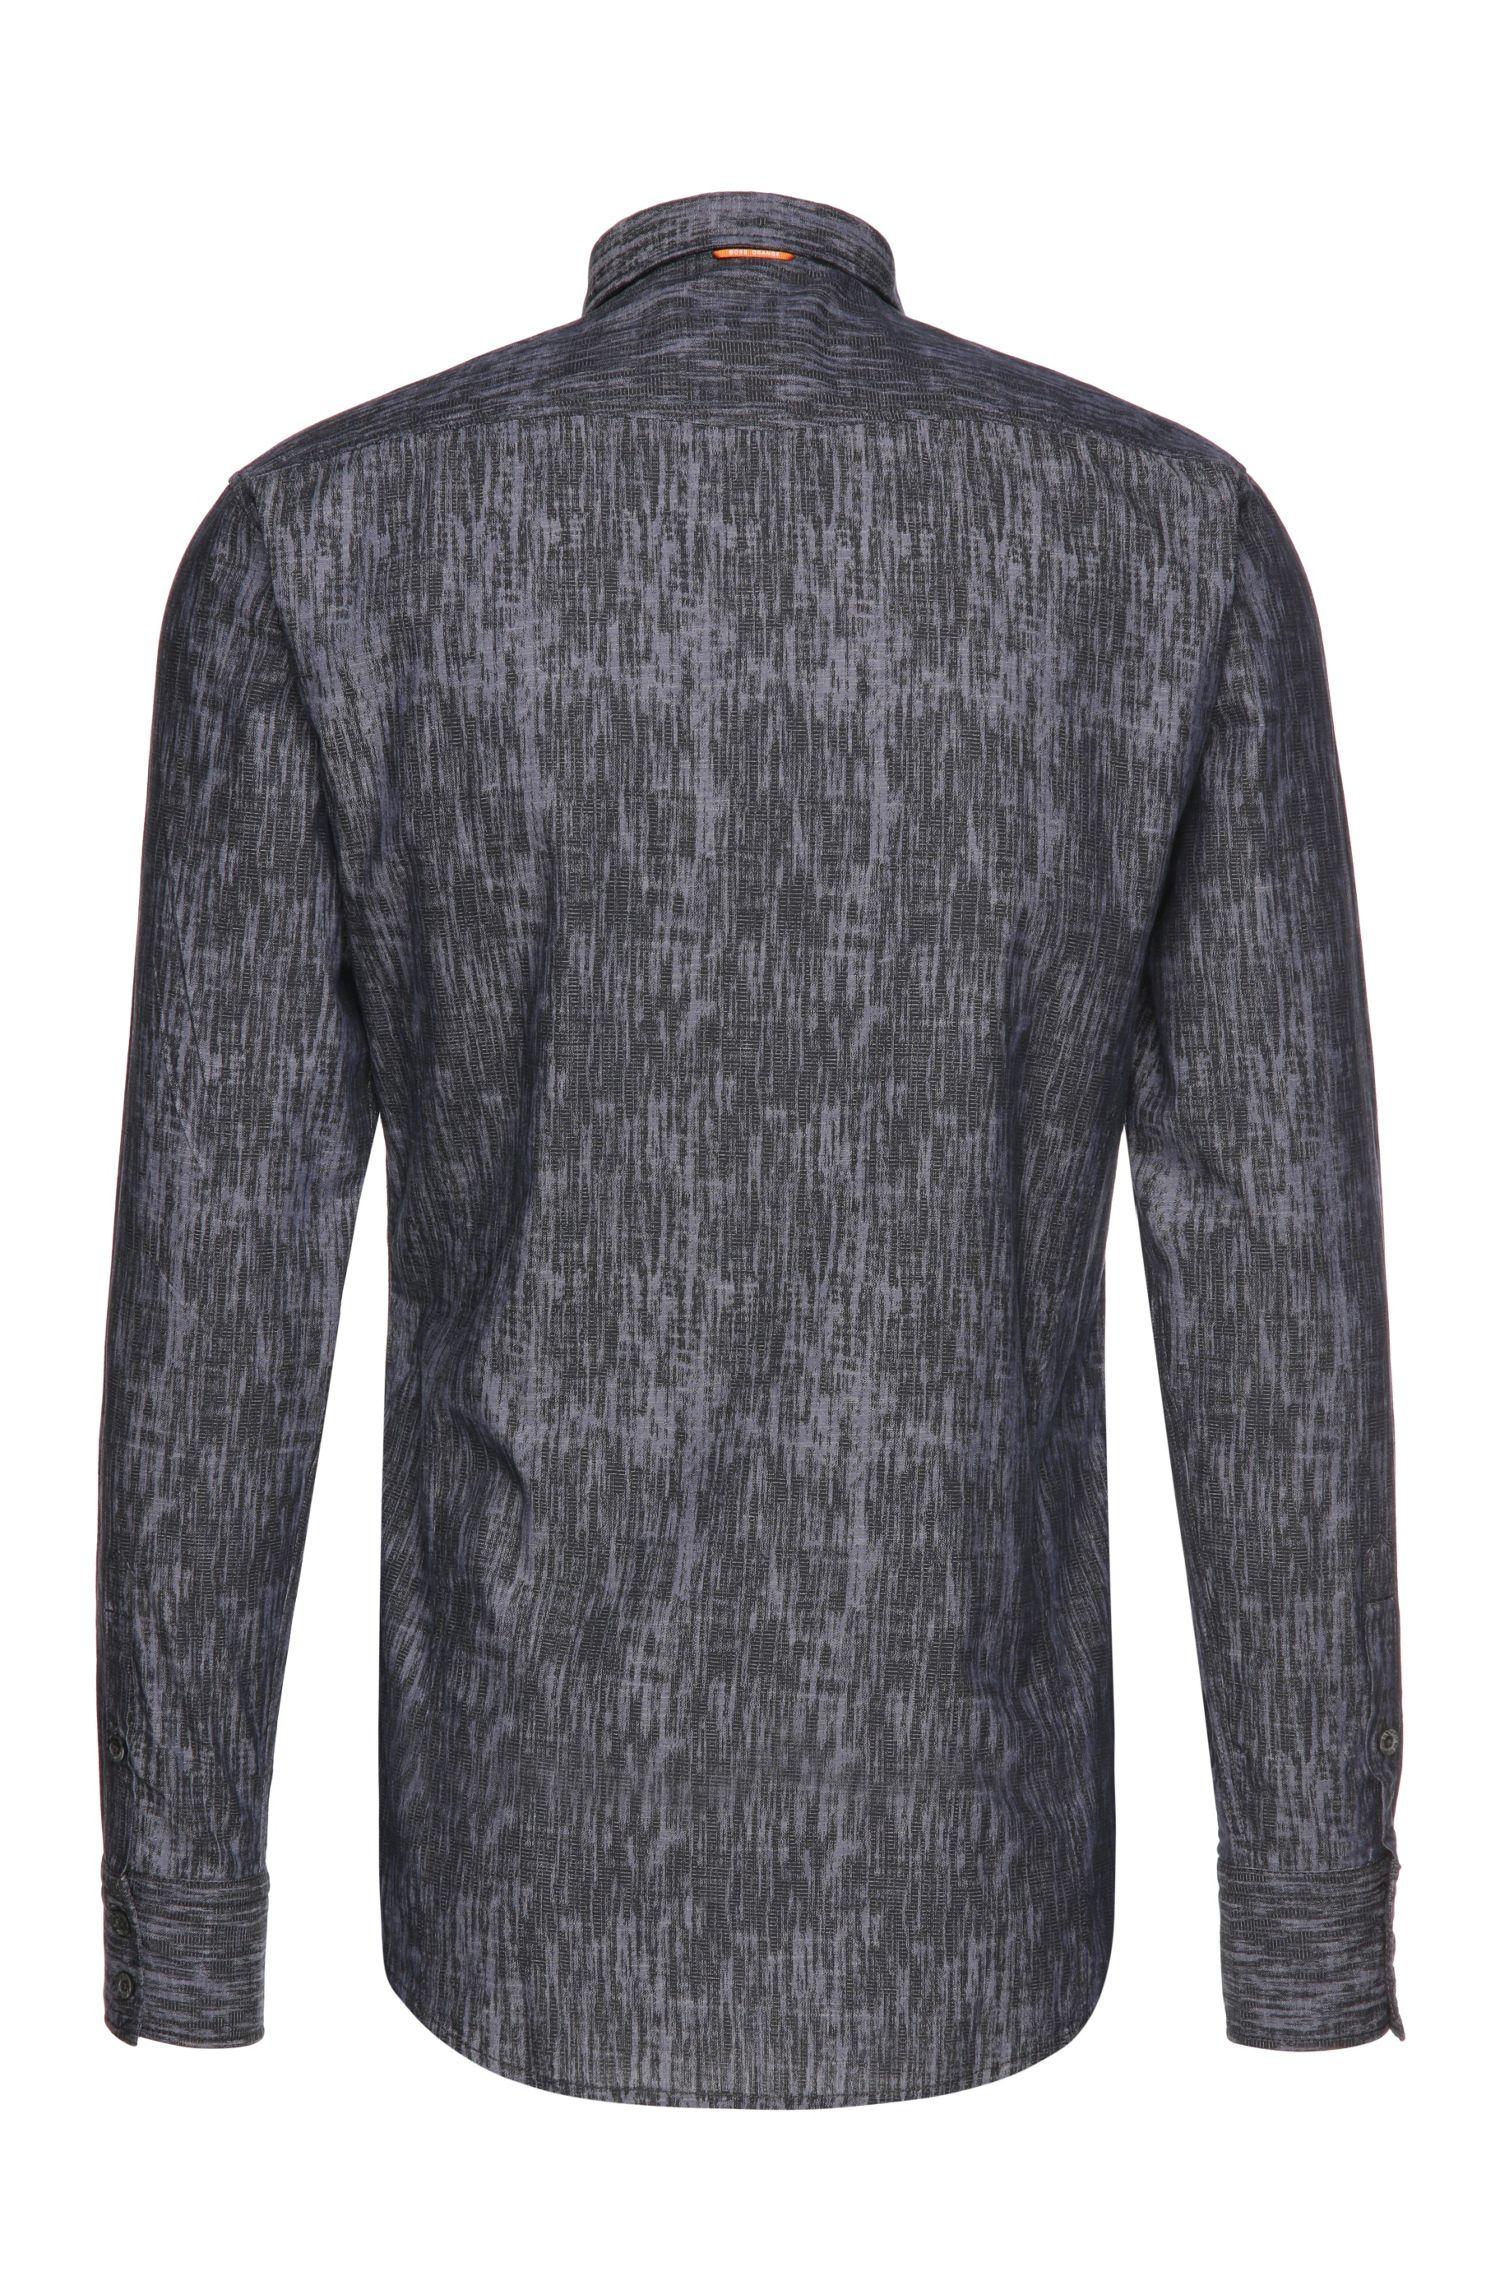 Gemustertes Slim-Fit Hemd aus Baumwolle mit Textur: ´EdoslimE`